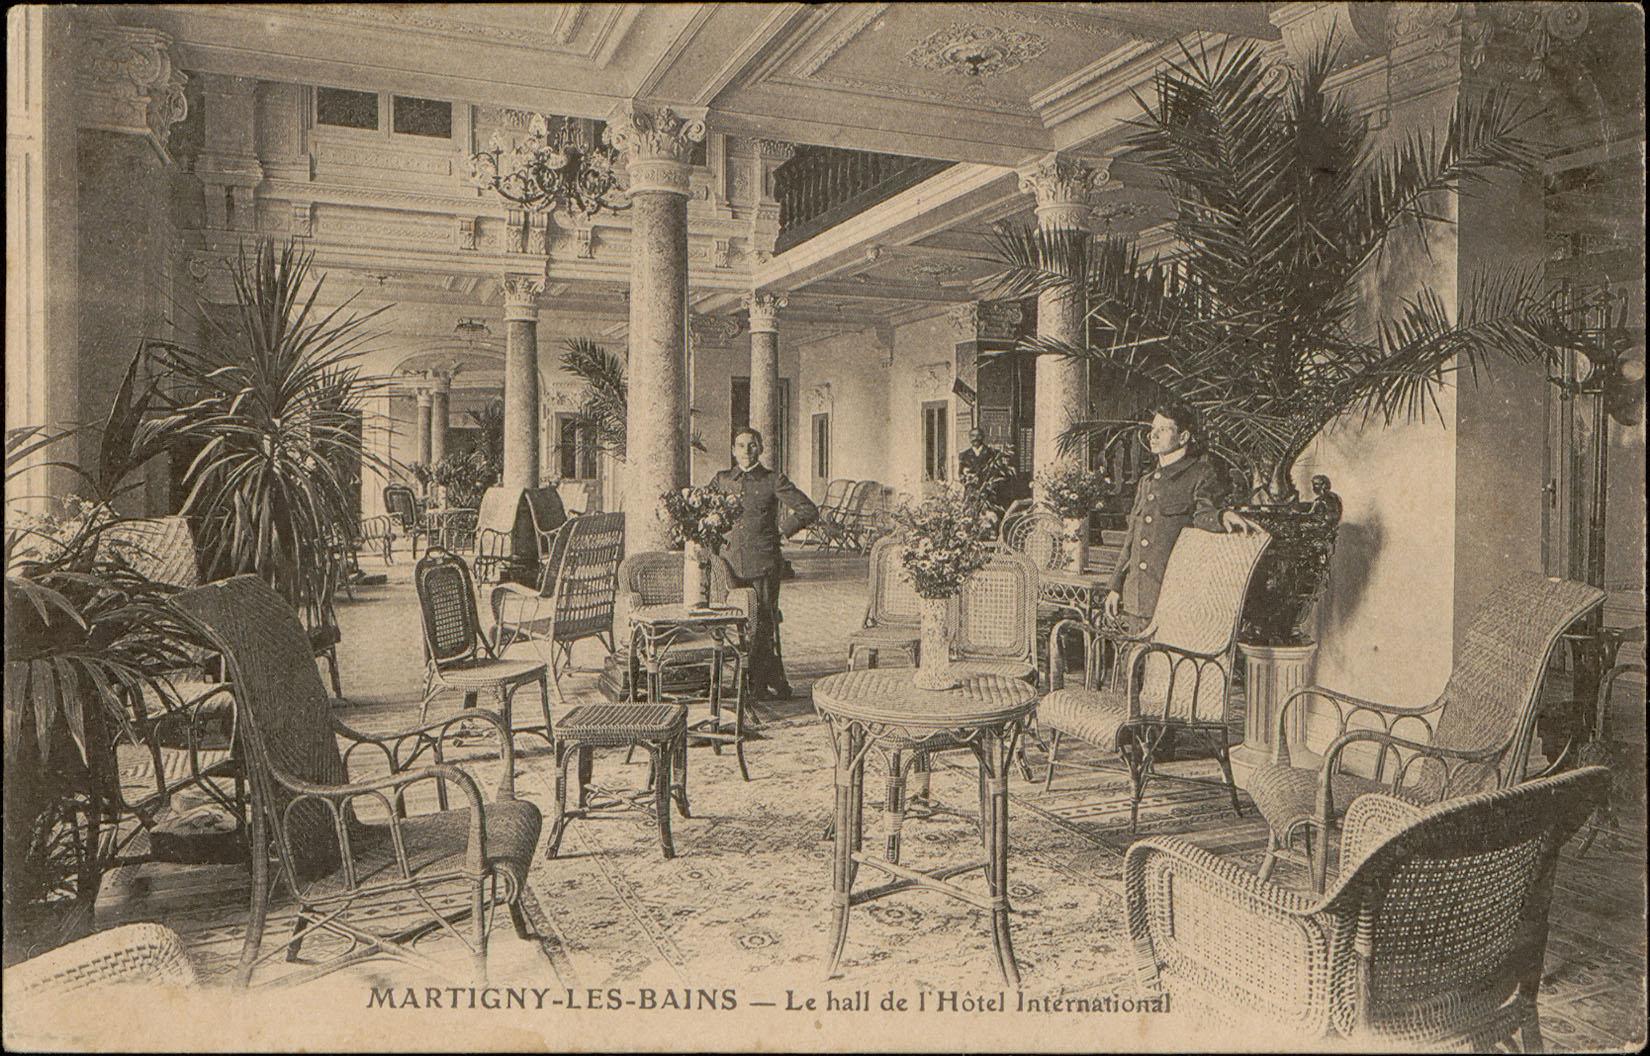 Contenu du Martigny-les-Bains, Le Hall de l'Hôtel International